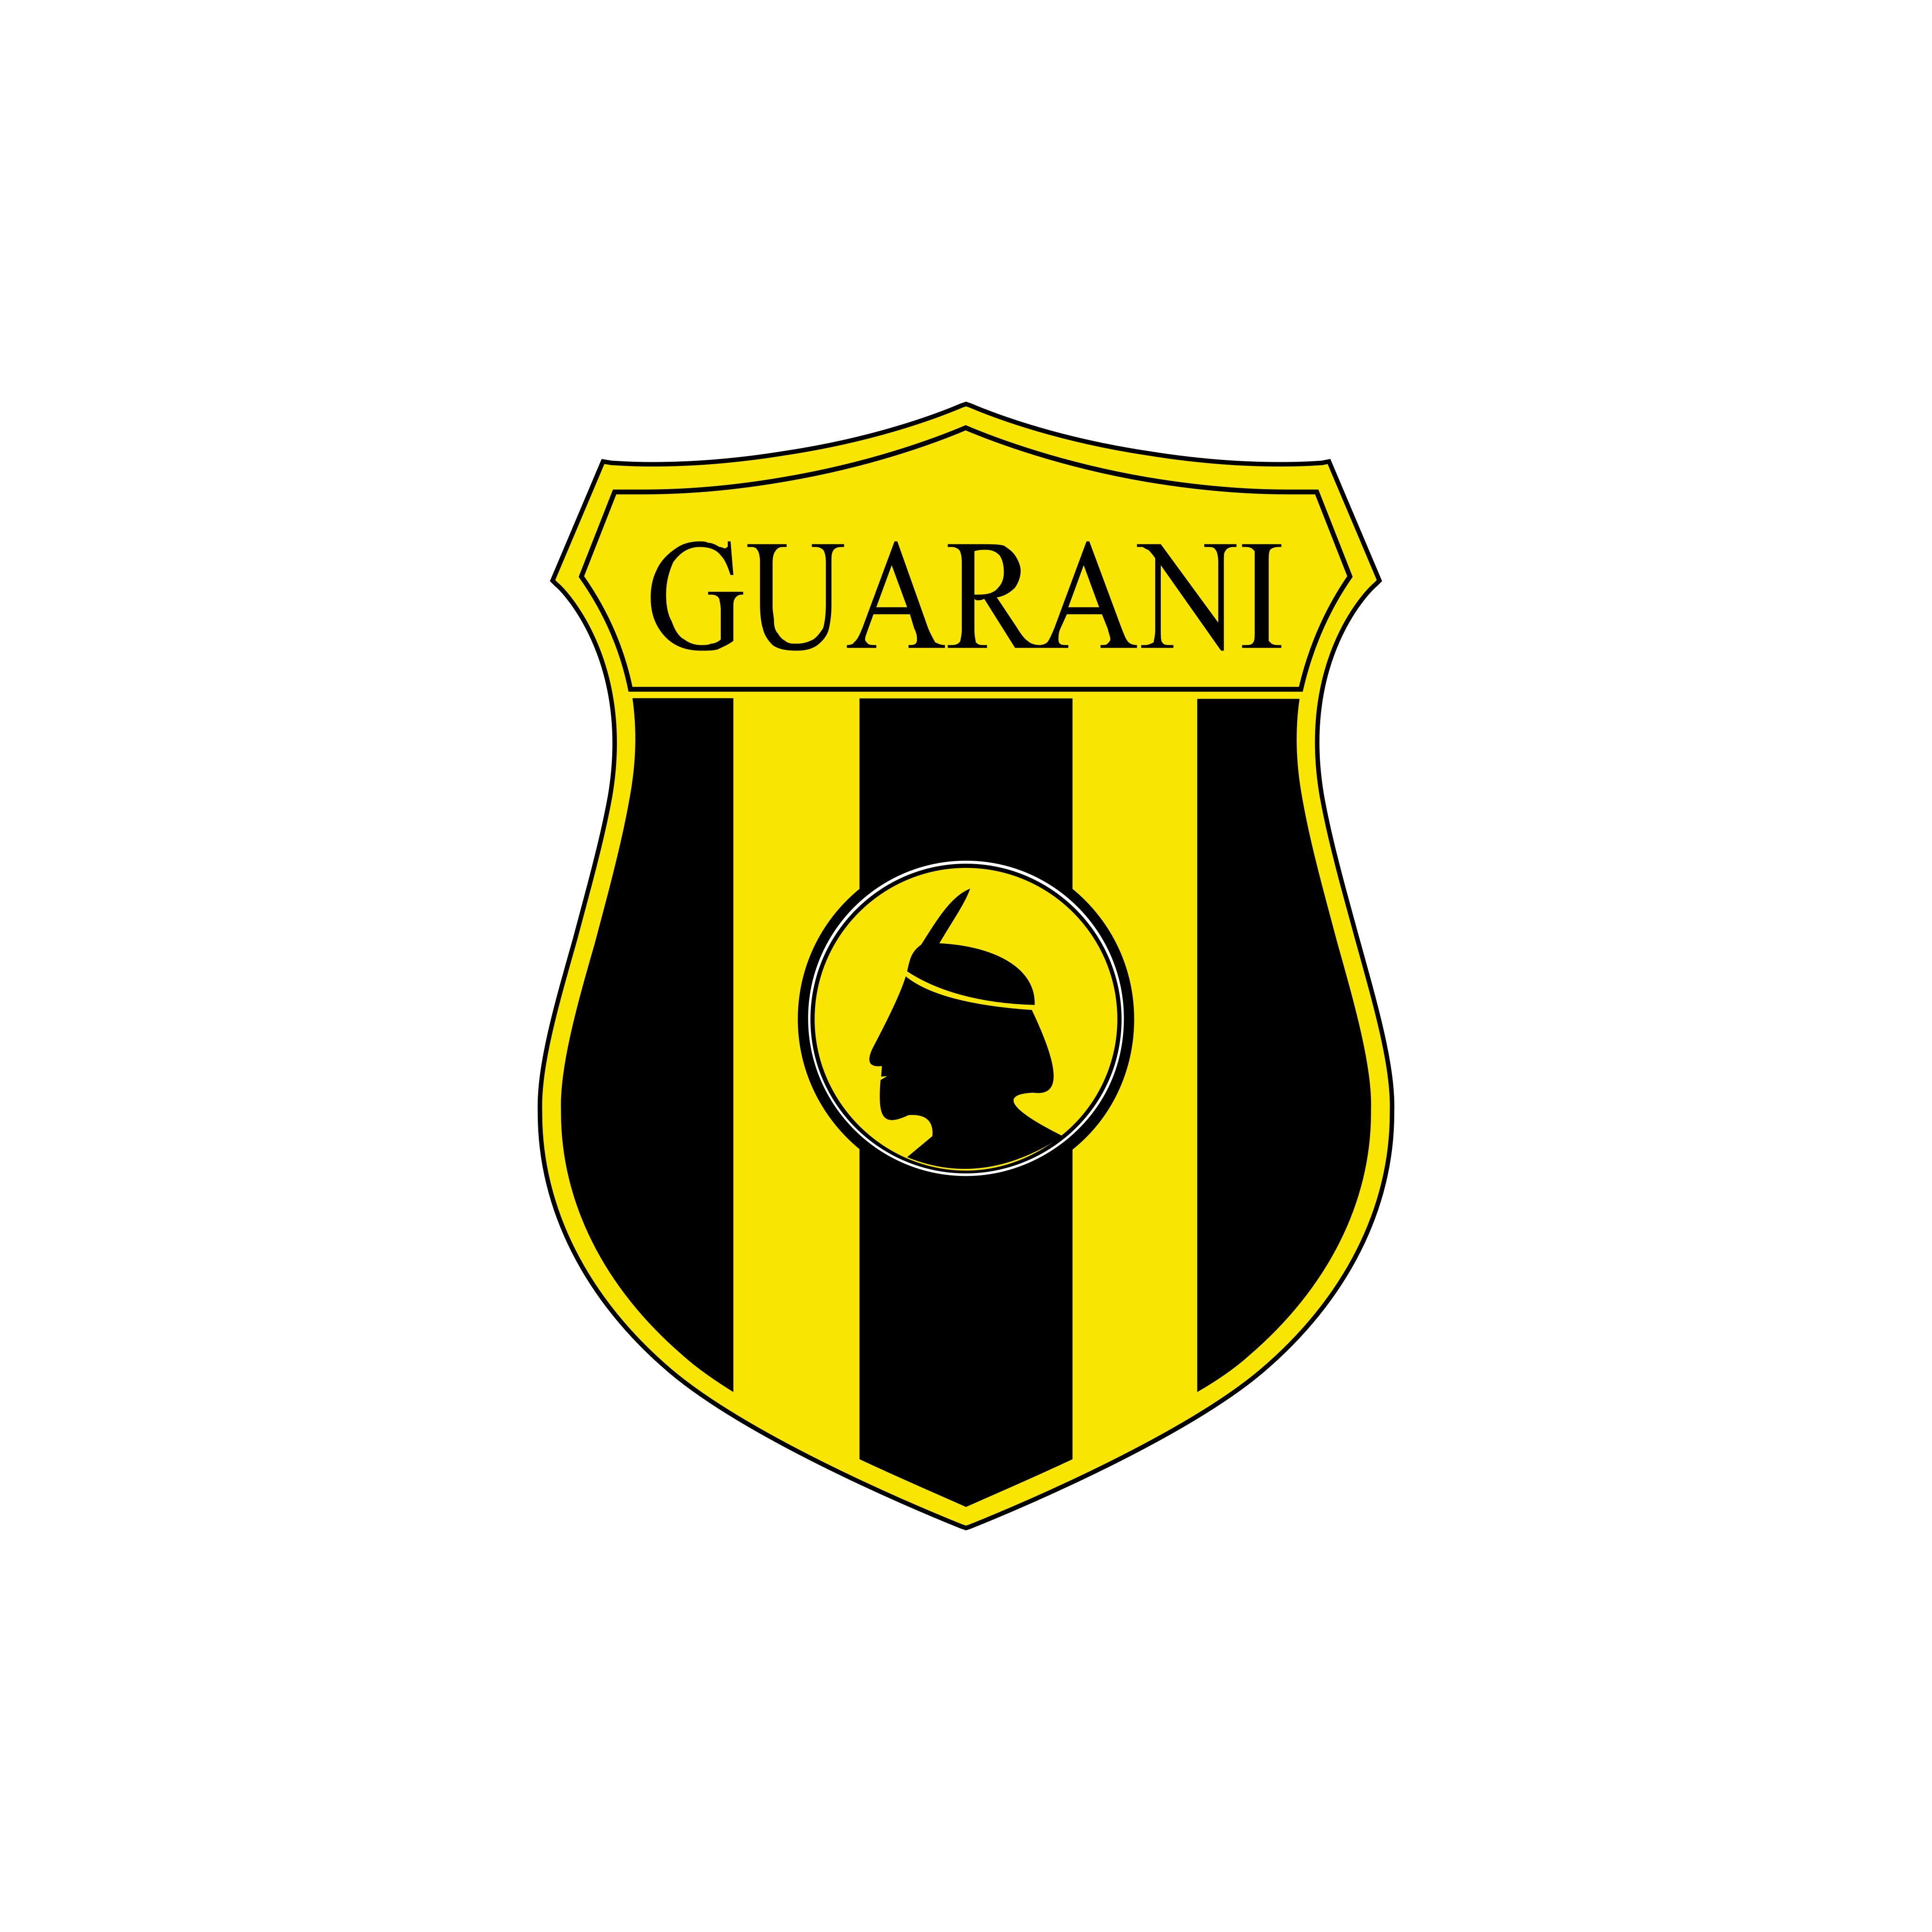 club guarani logo 0 - Club Guaraní Logo